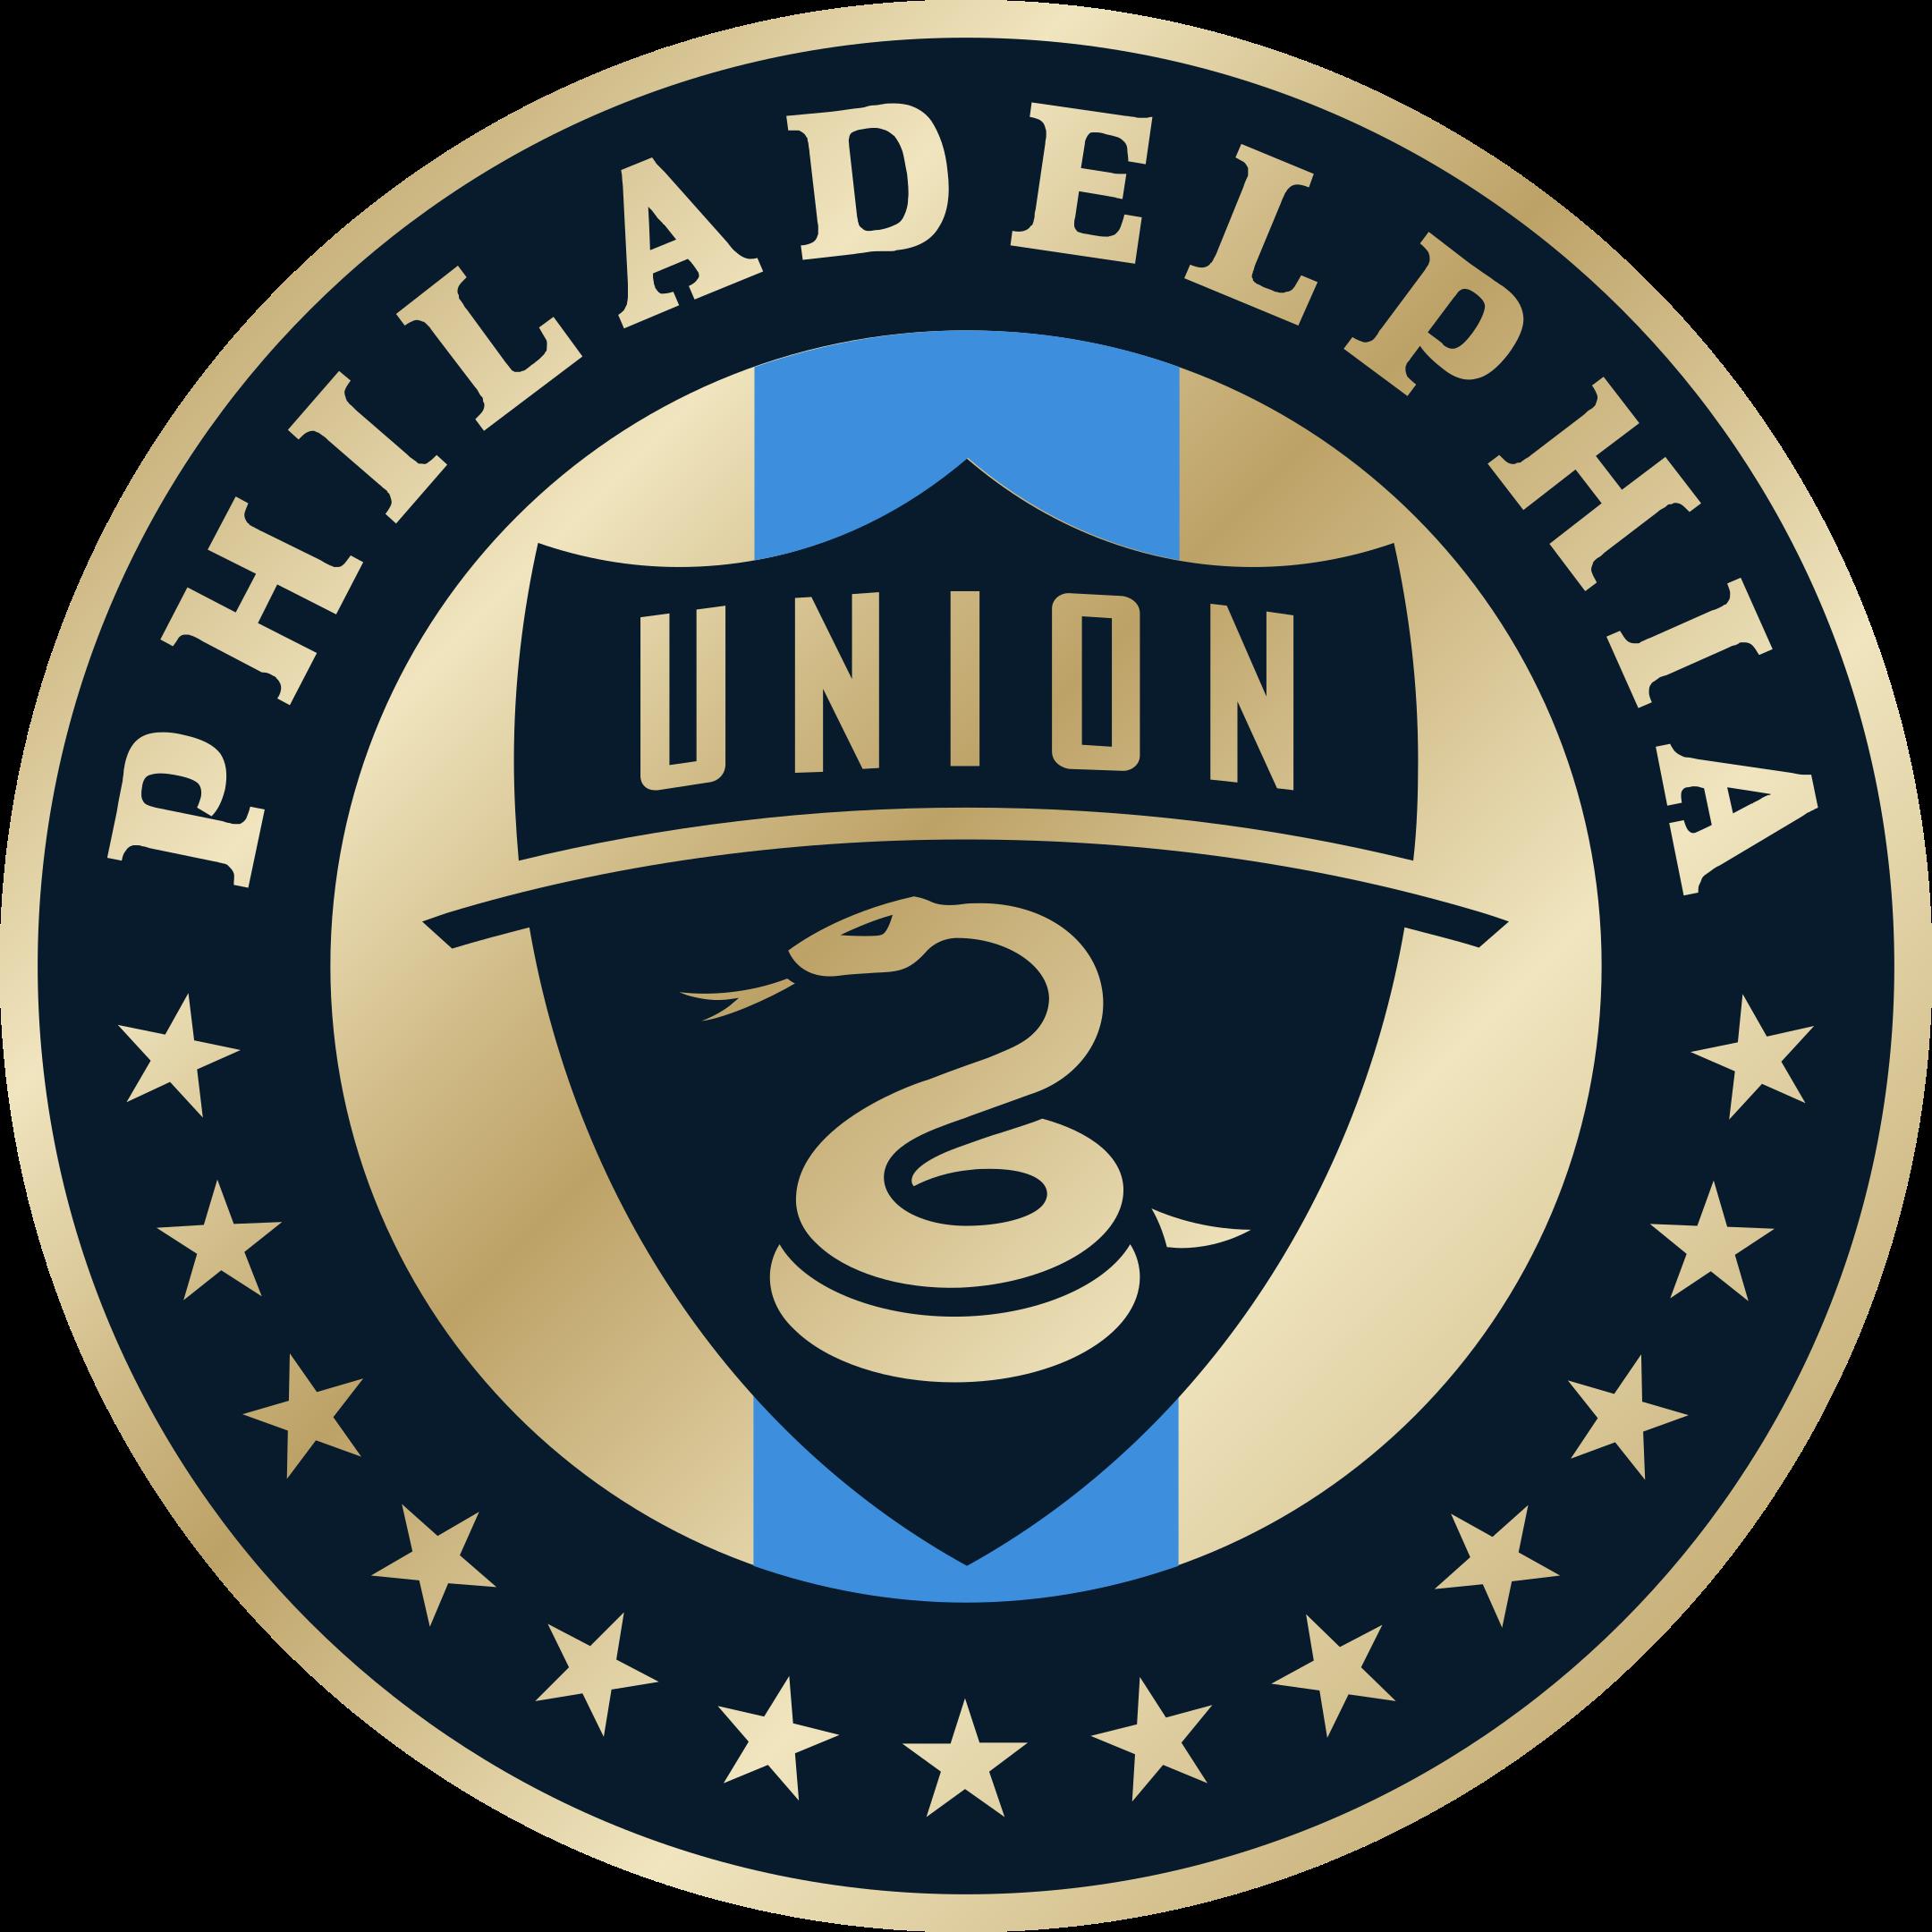 philadelphia union logo 1 - Philadelphia Union Logo